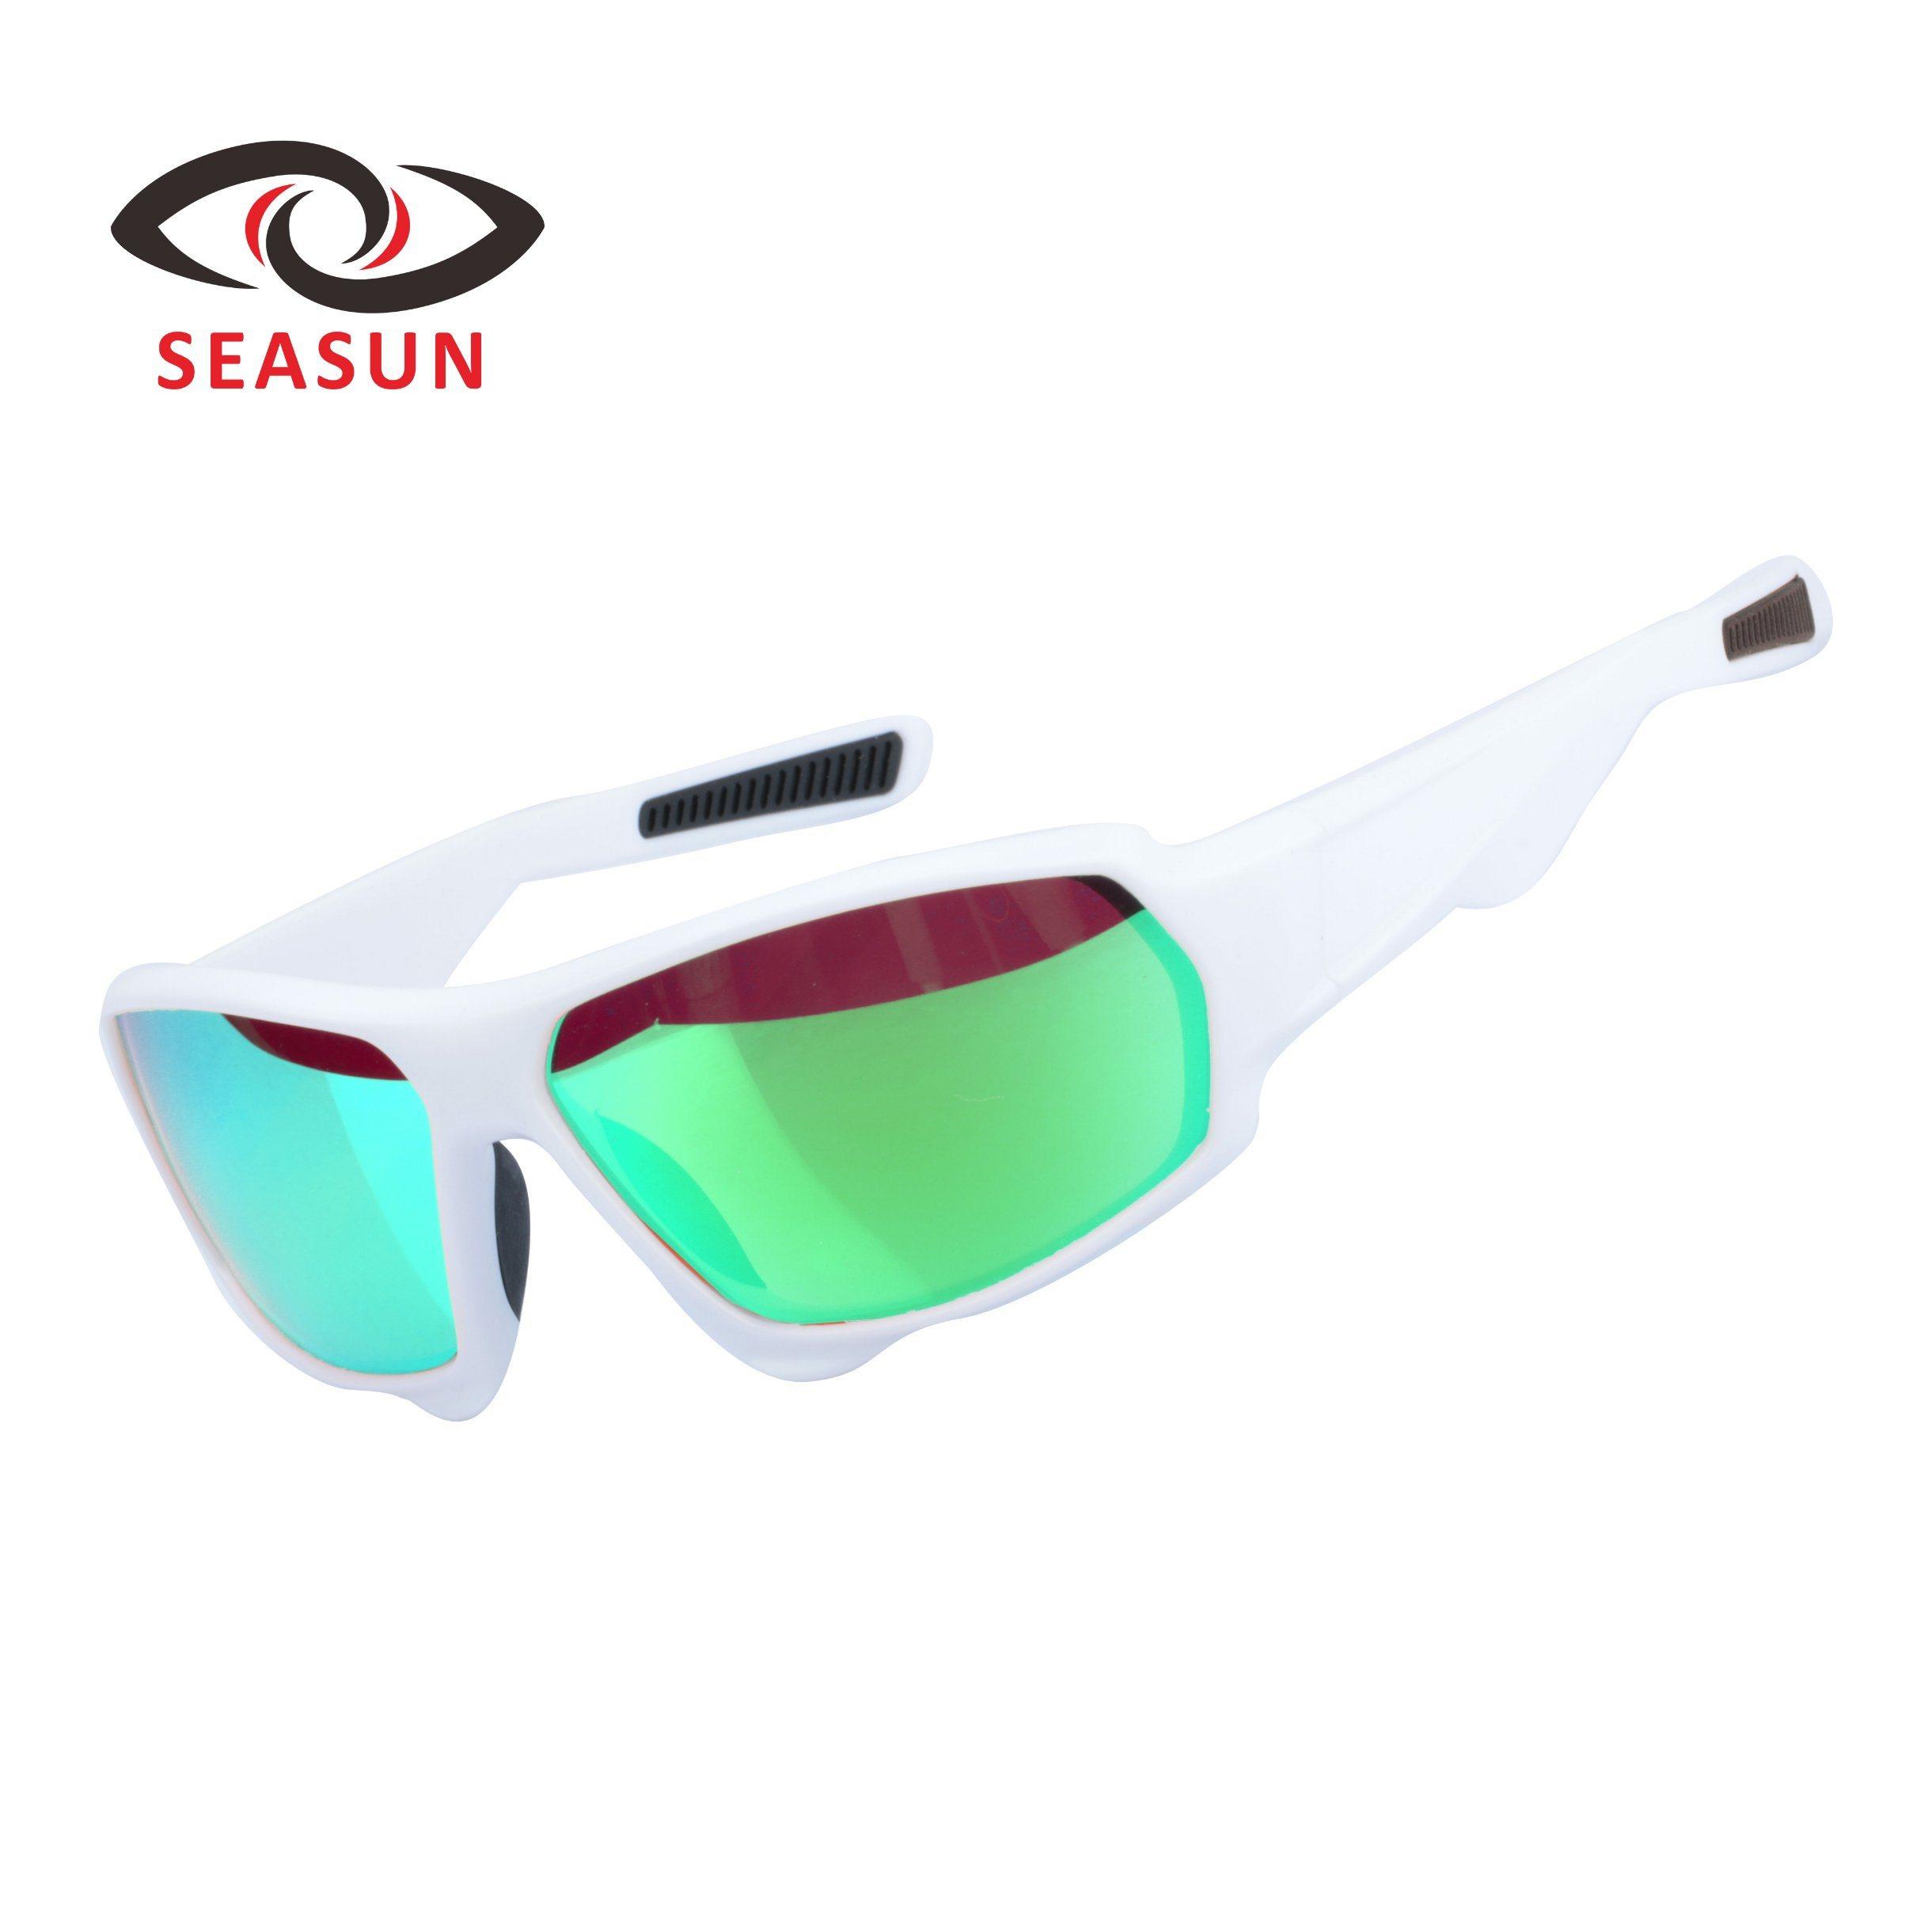 Polarized Cycling Sunglasses Bike Goggles Eyewear Sport Glasses UV400